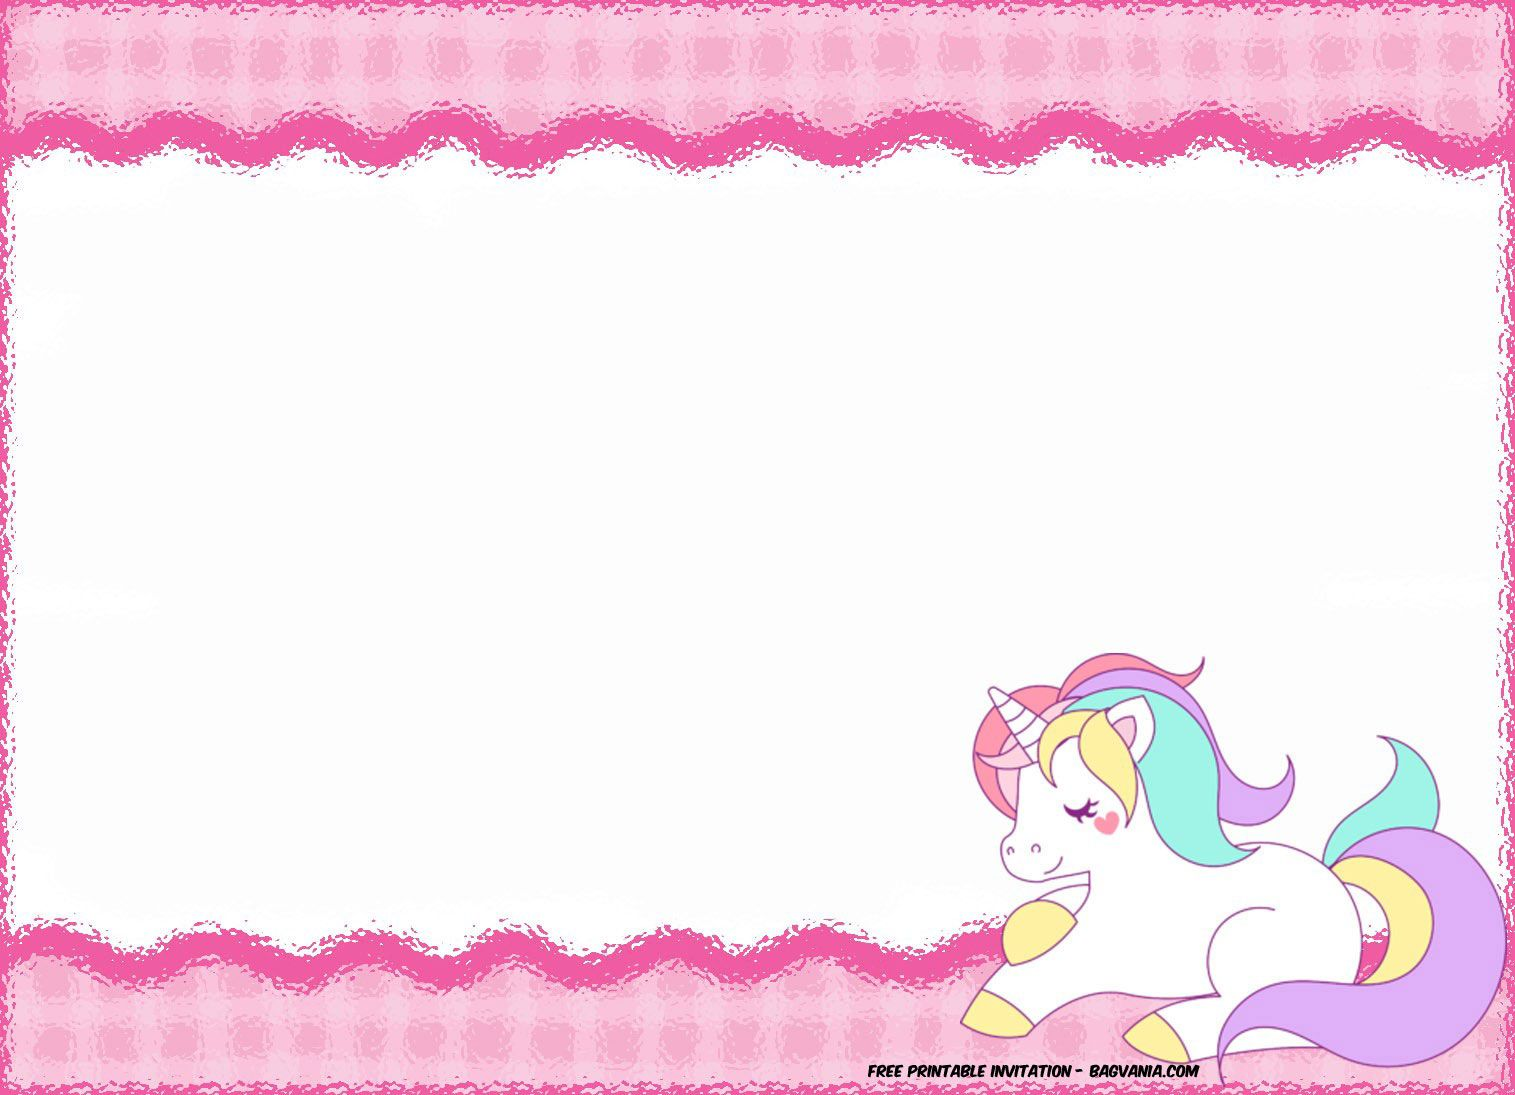 Download FREE Printable Golden Unicorn Birthday Invitation Template